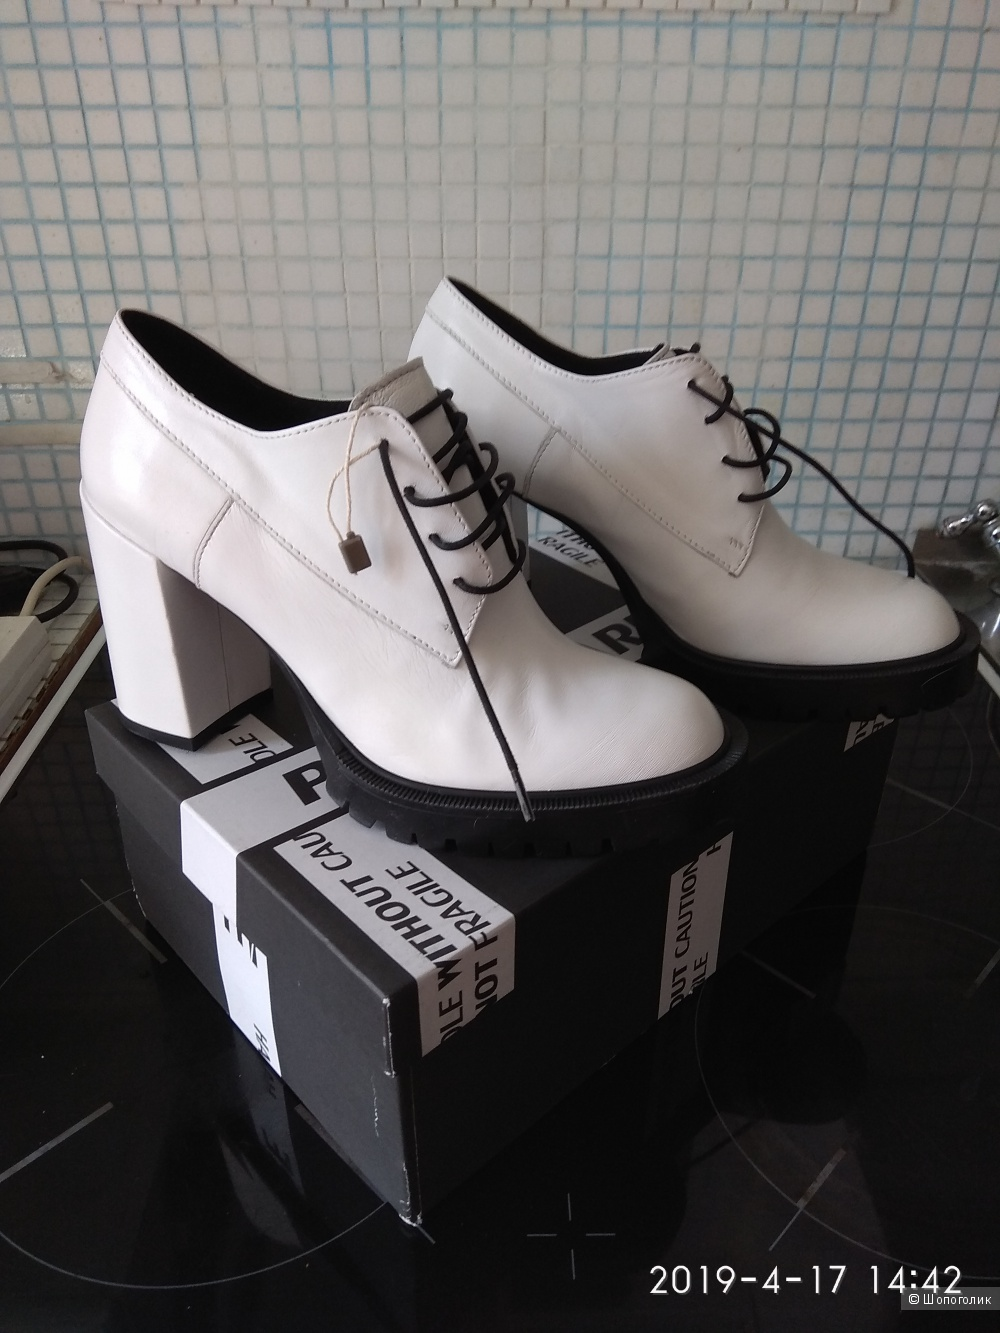 Туфли,натуральная кожа,,бренд PIERRE DARRE,39 размер